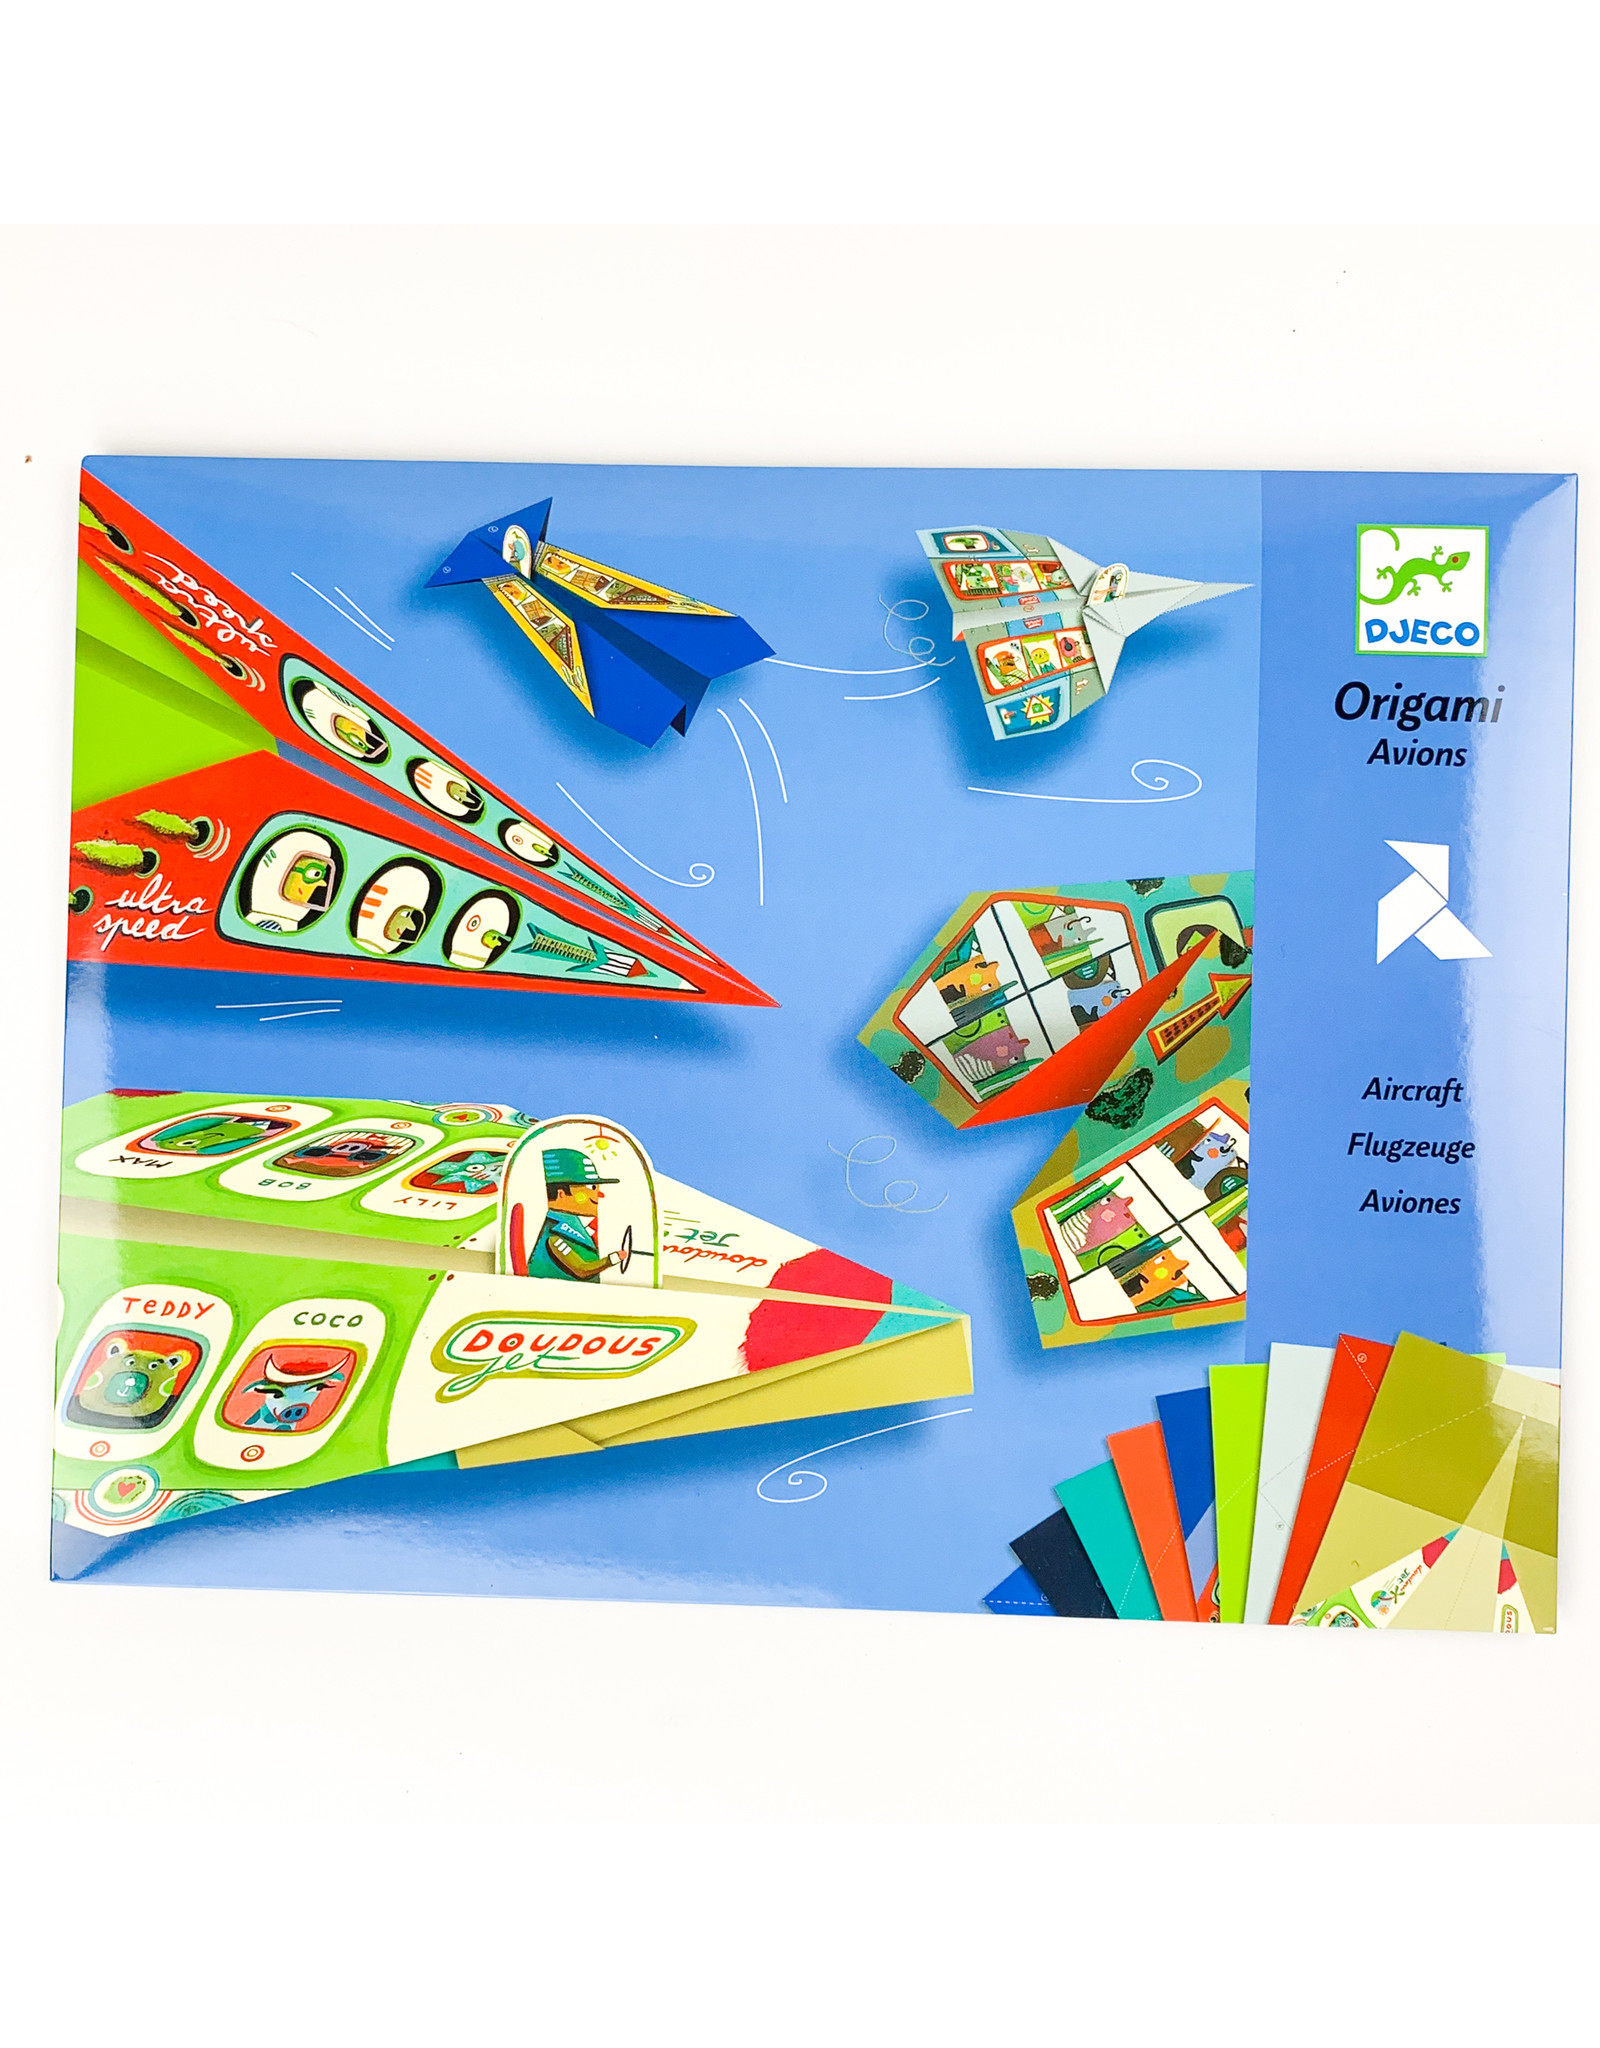 Djeco Plane origami